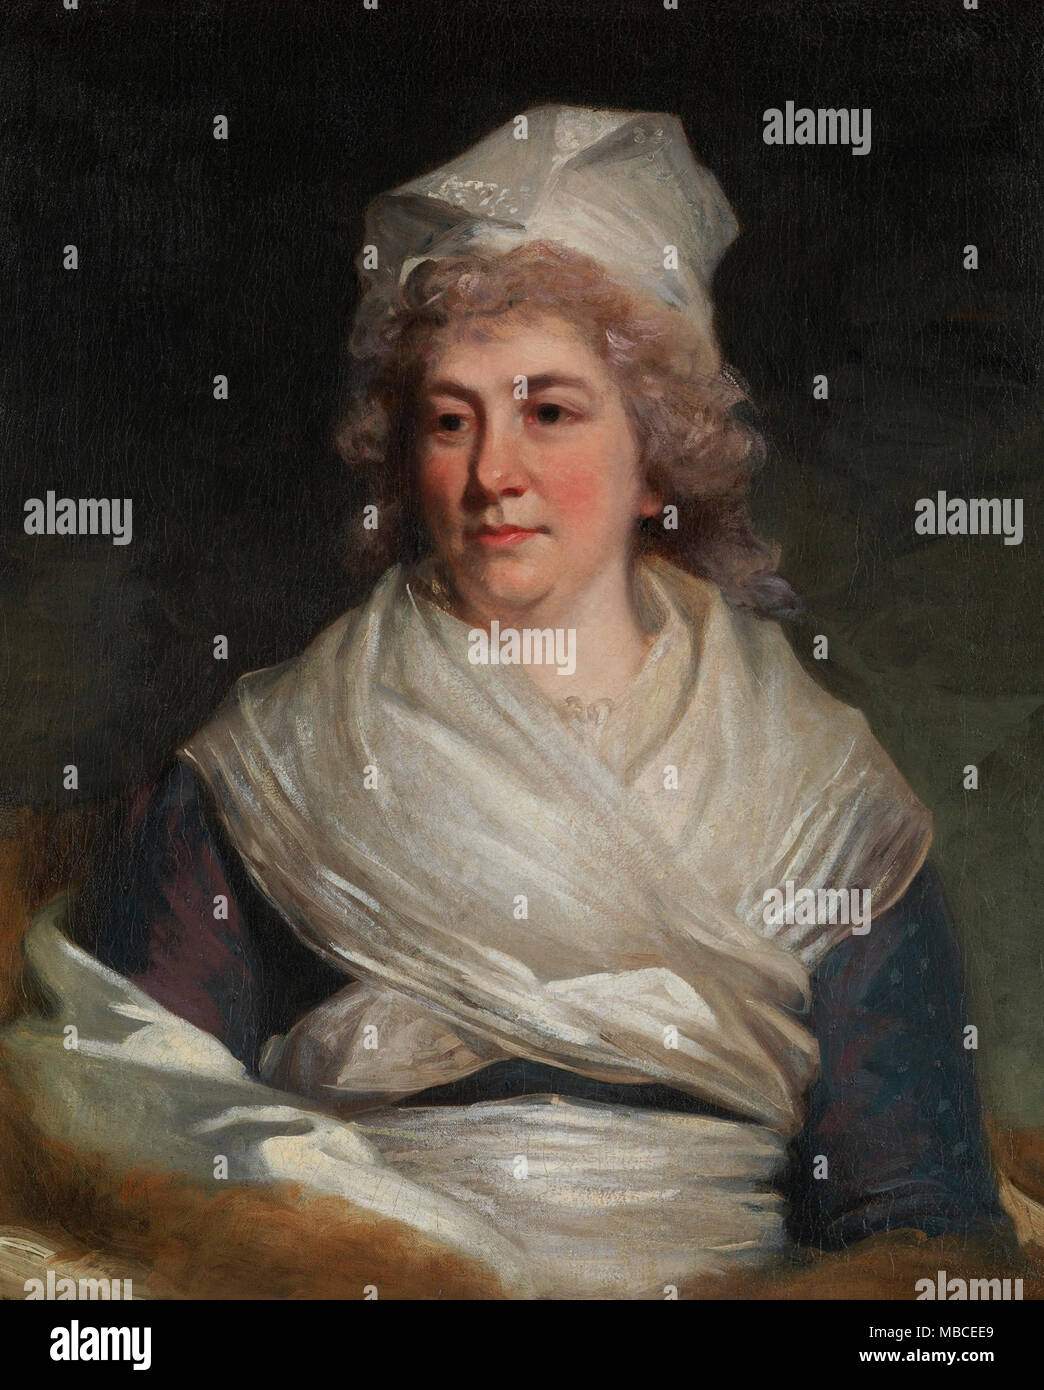 Portrait of Sarah Franklin Bache - John Hoppner, circa 1793 - Stock Image